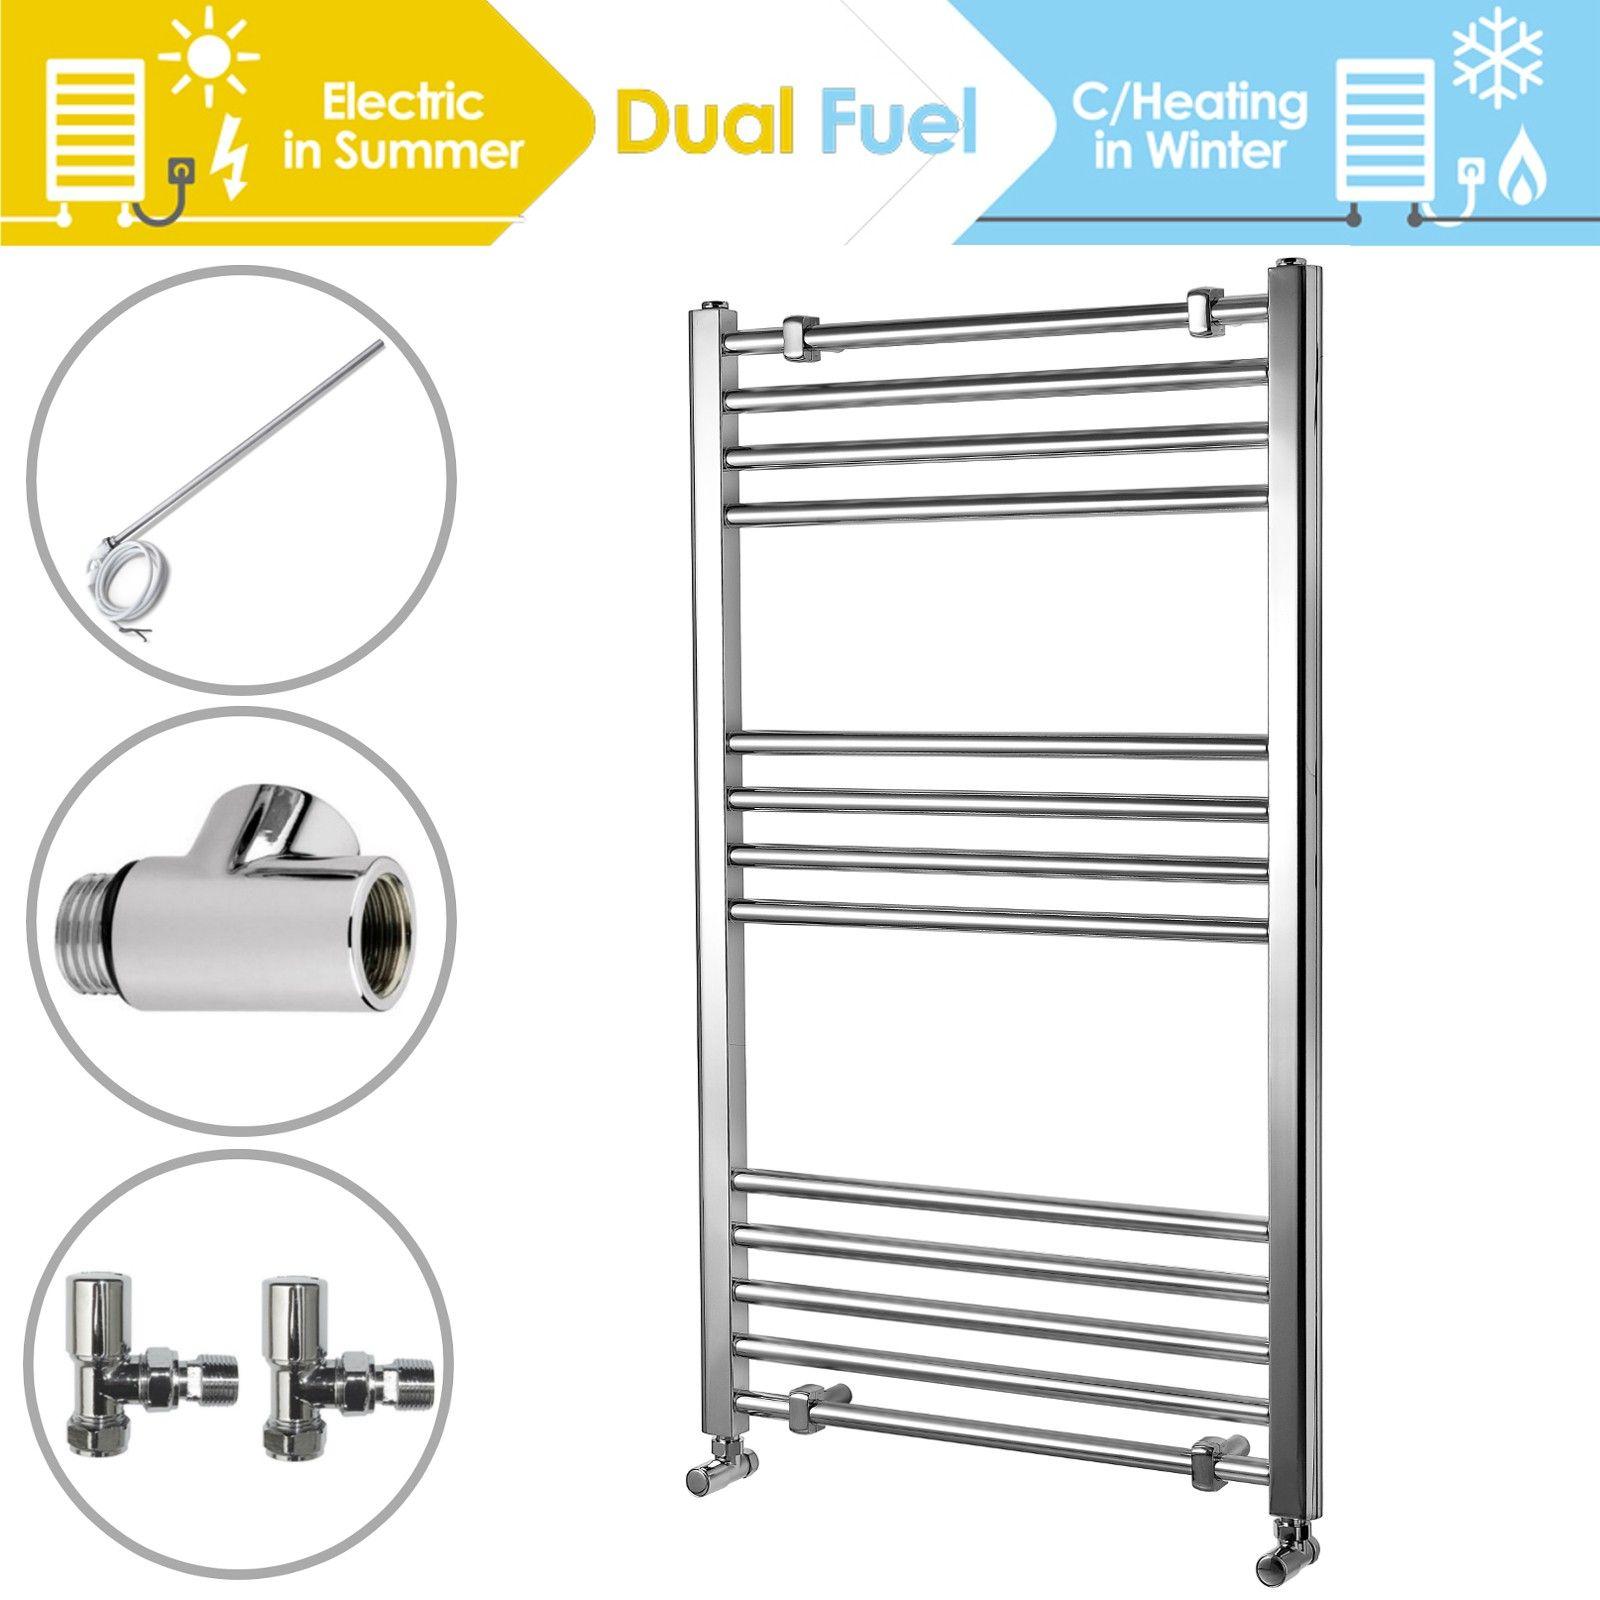 ENKI 1000 x 600 mm Curved Heated Towel Rail Radiator incl Dual Fuel Kit